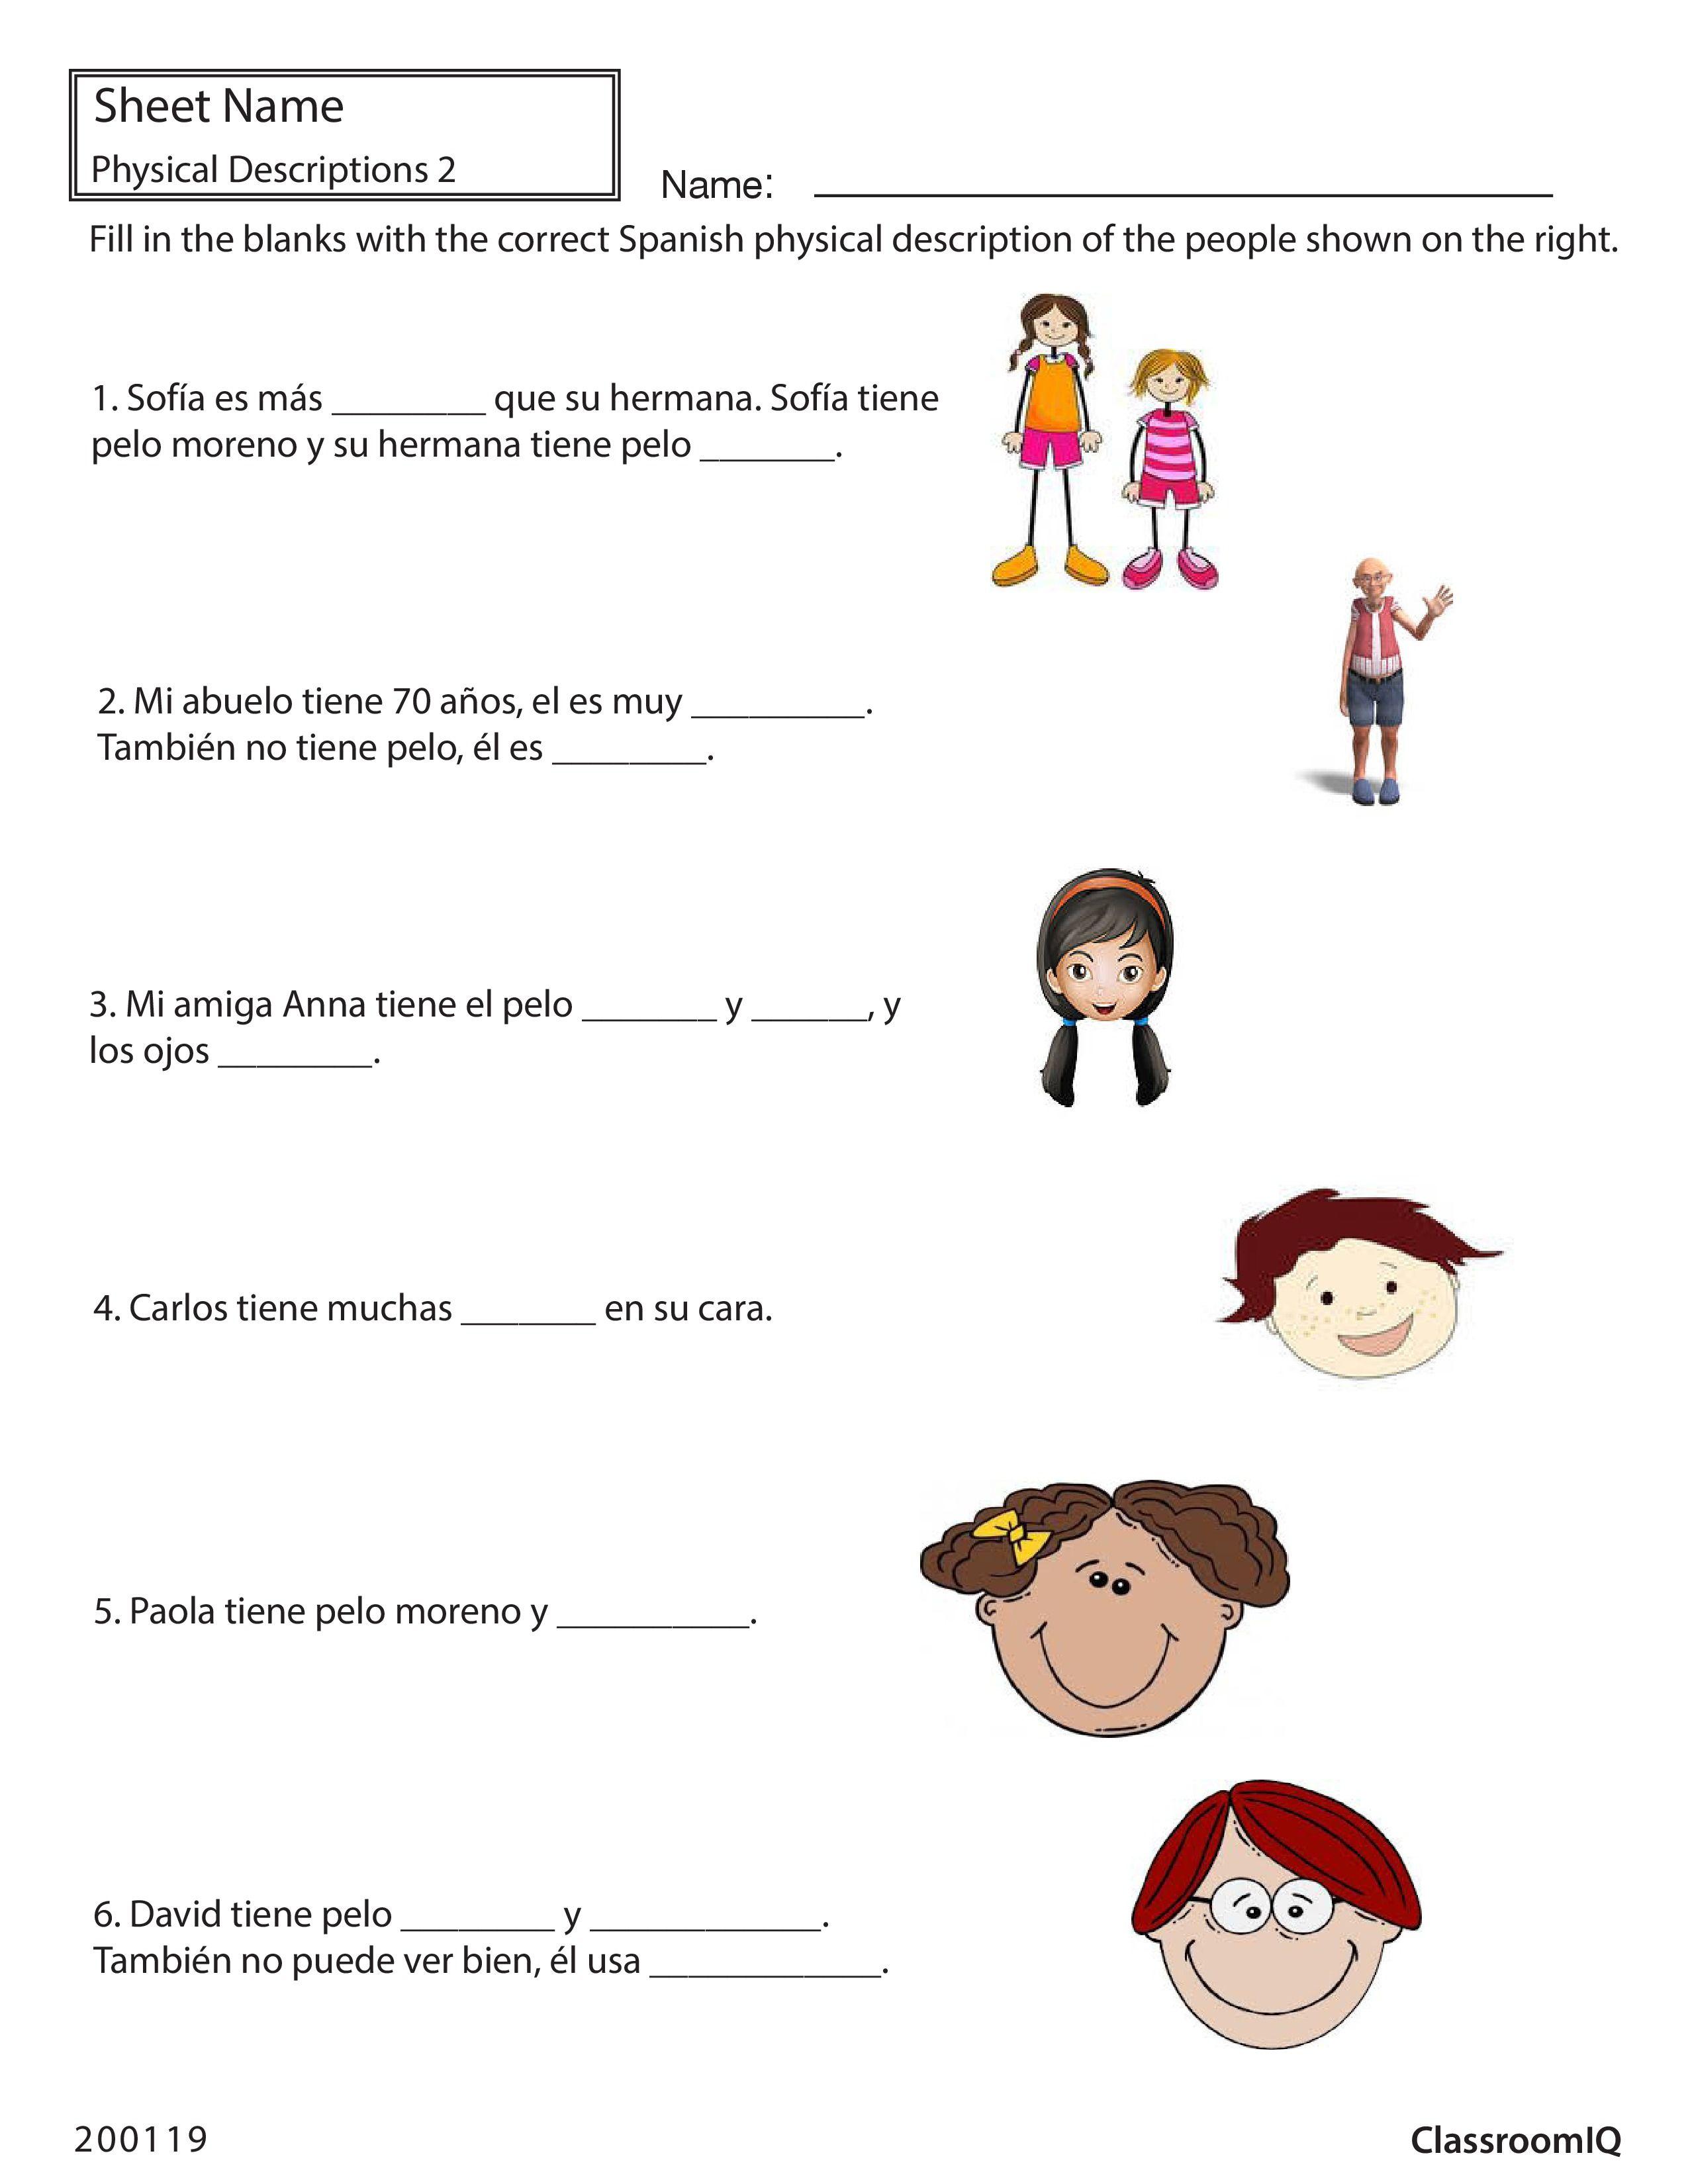 Spanish Physical Descriptions Classroomiq